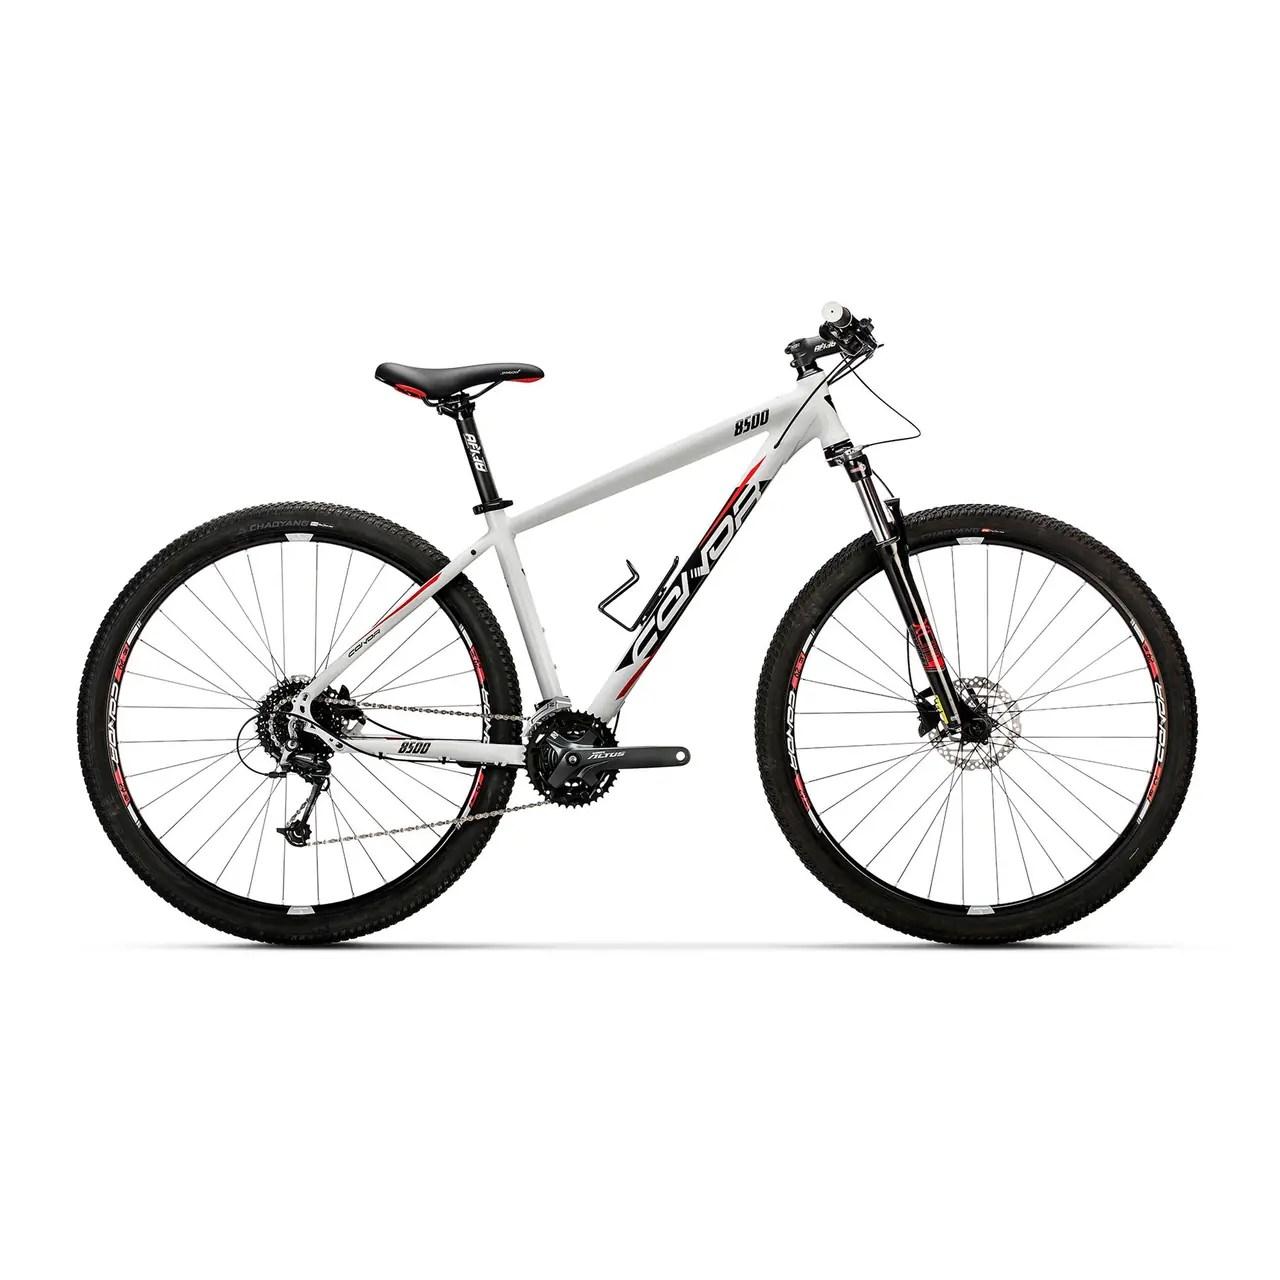 Bicicleta CONOR 8500 Deore 29 Pulgadas.